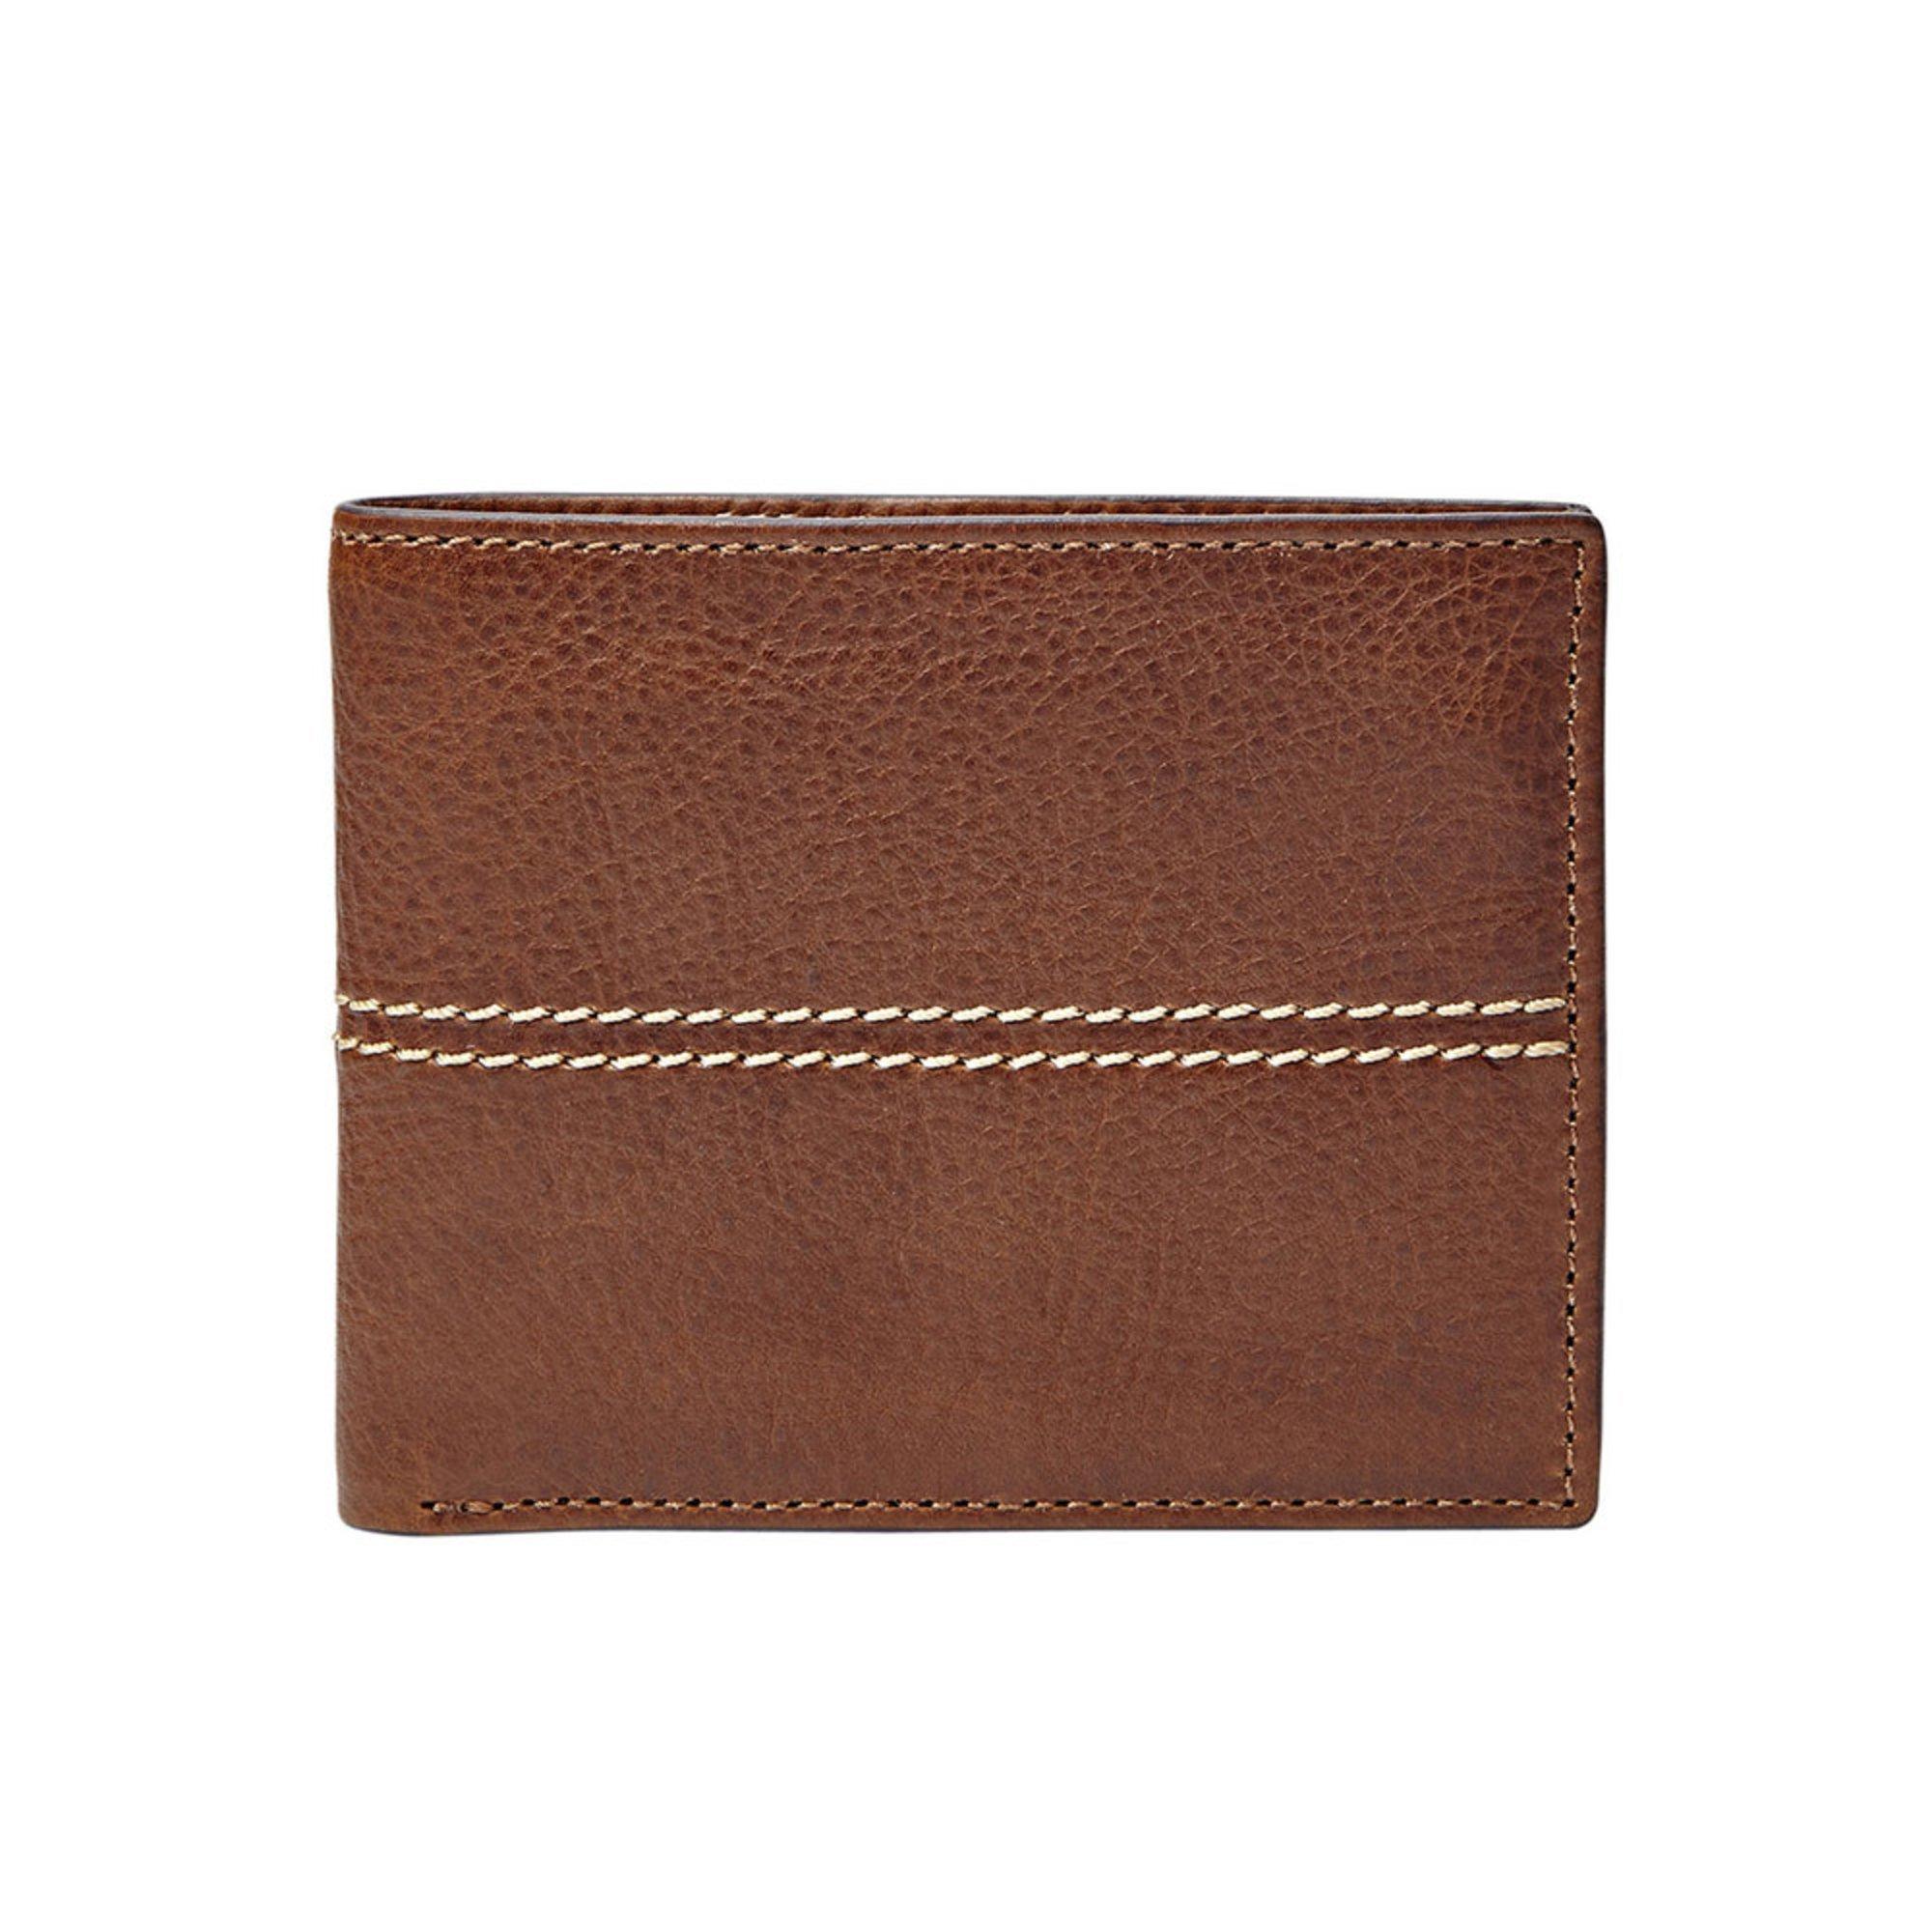 Fossil Turk Bifold Front Pocket Id Wallet